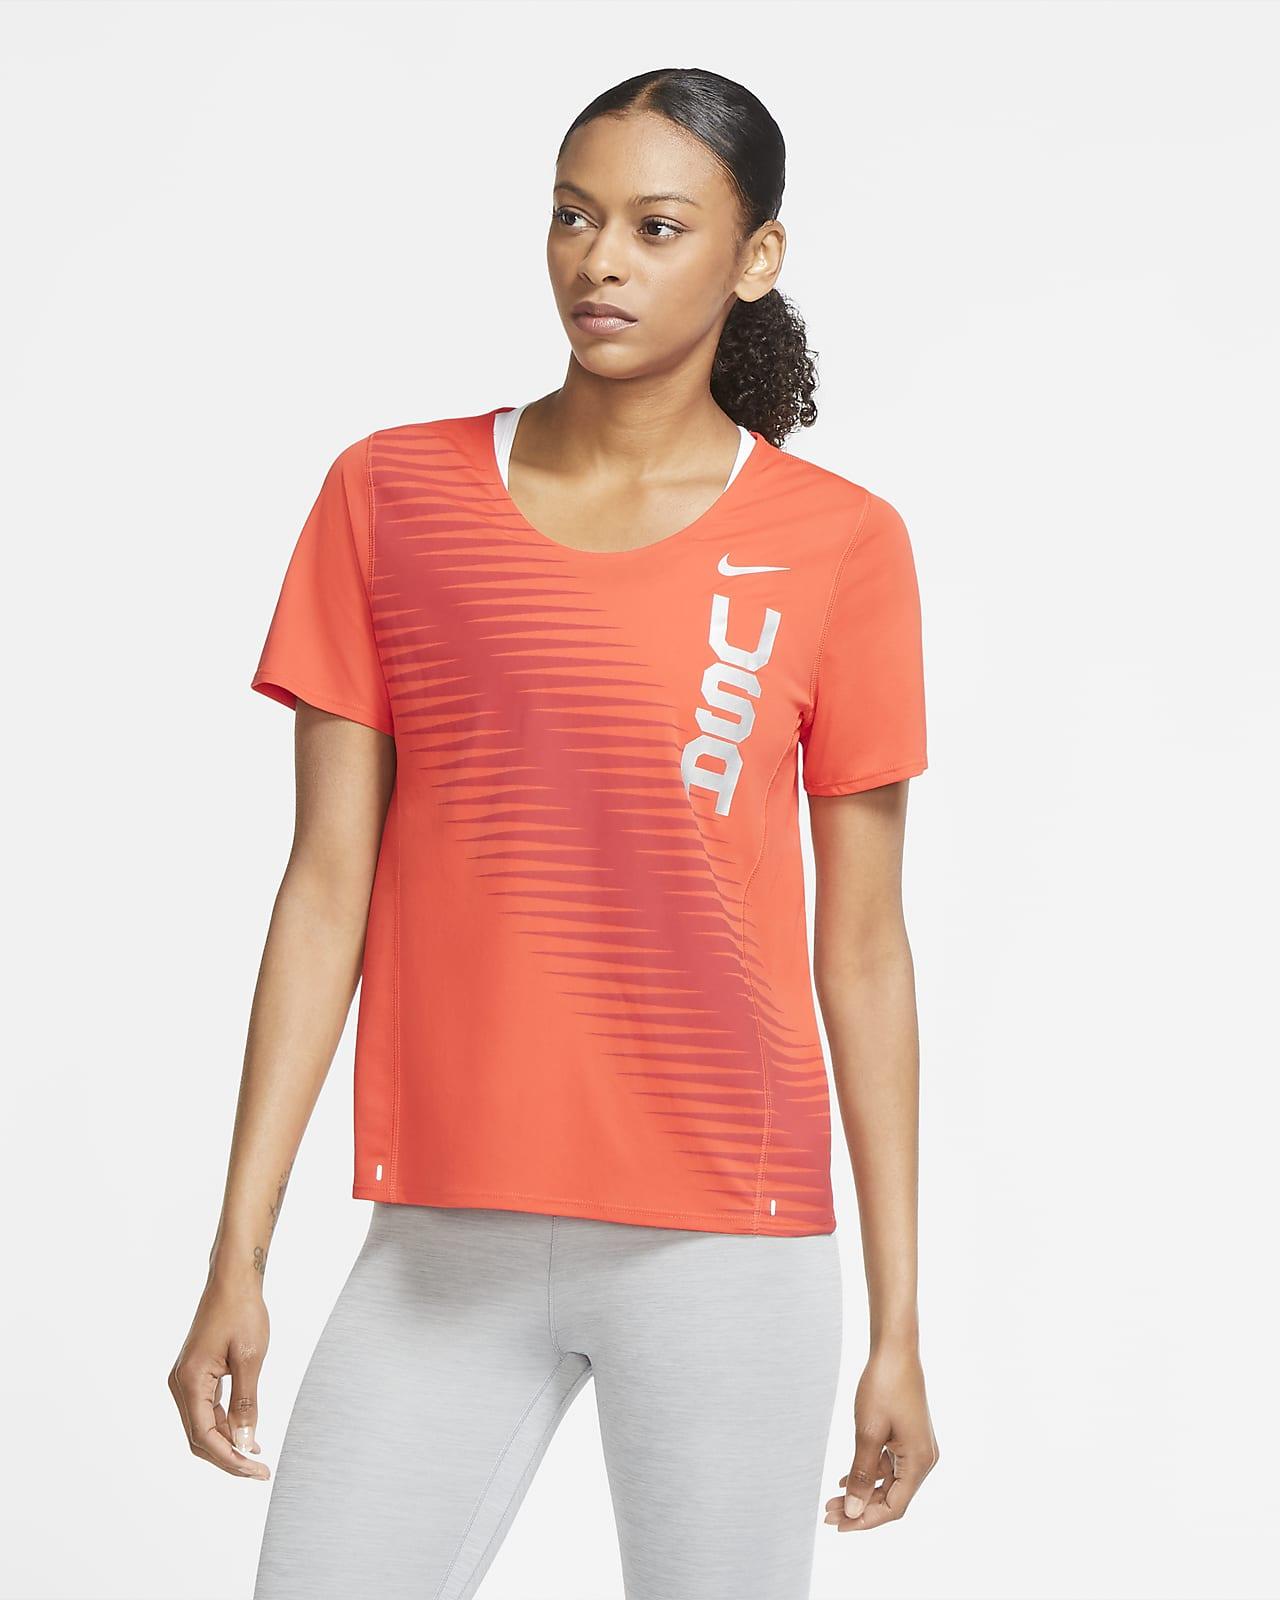 Löpartröja Nike Team USA City Sleek för kvinnor